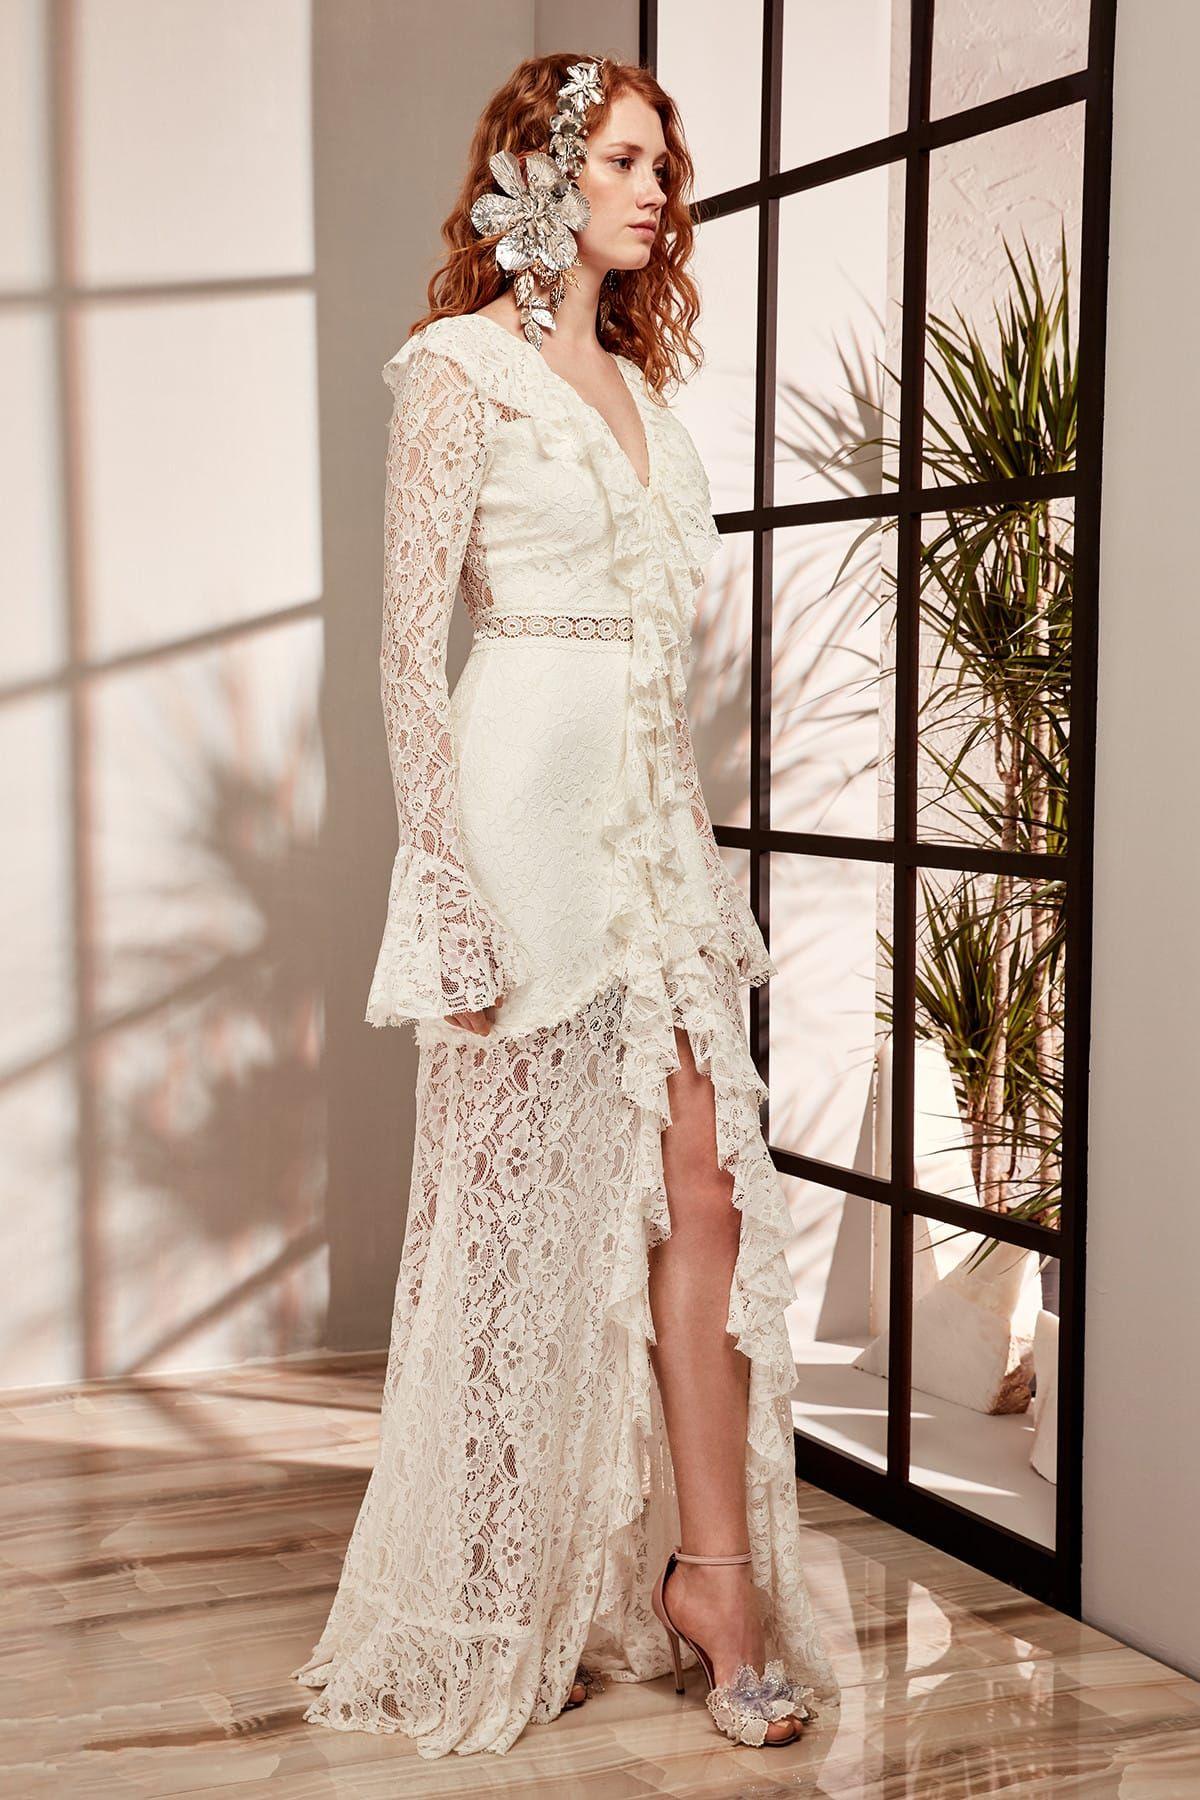 Claire Ekru Fermuar Detayli Abiye Elbise Tdpss19de0024 Raisa Vanessa Trendyol Dantel Gelinlik Elbise The Dress